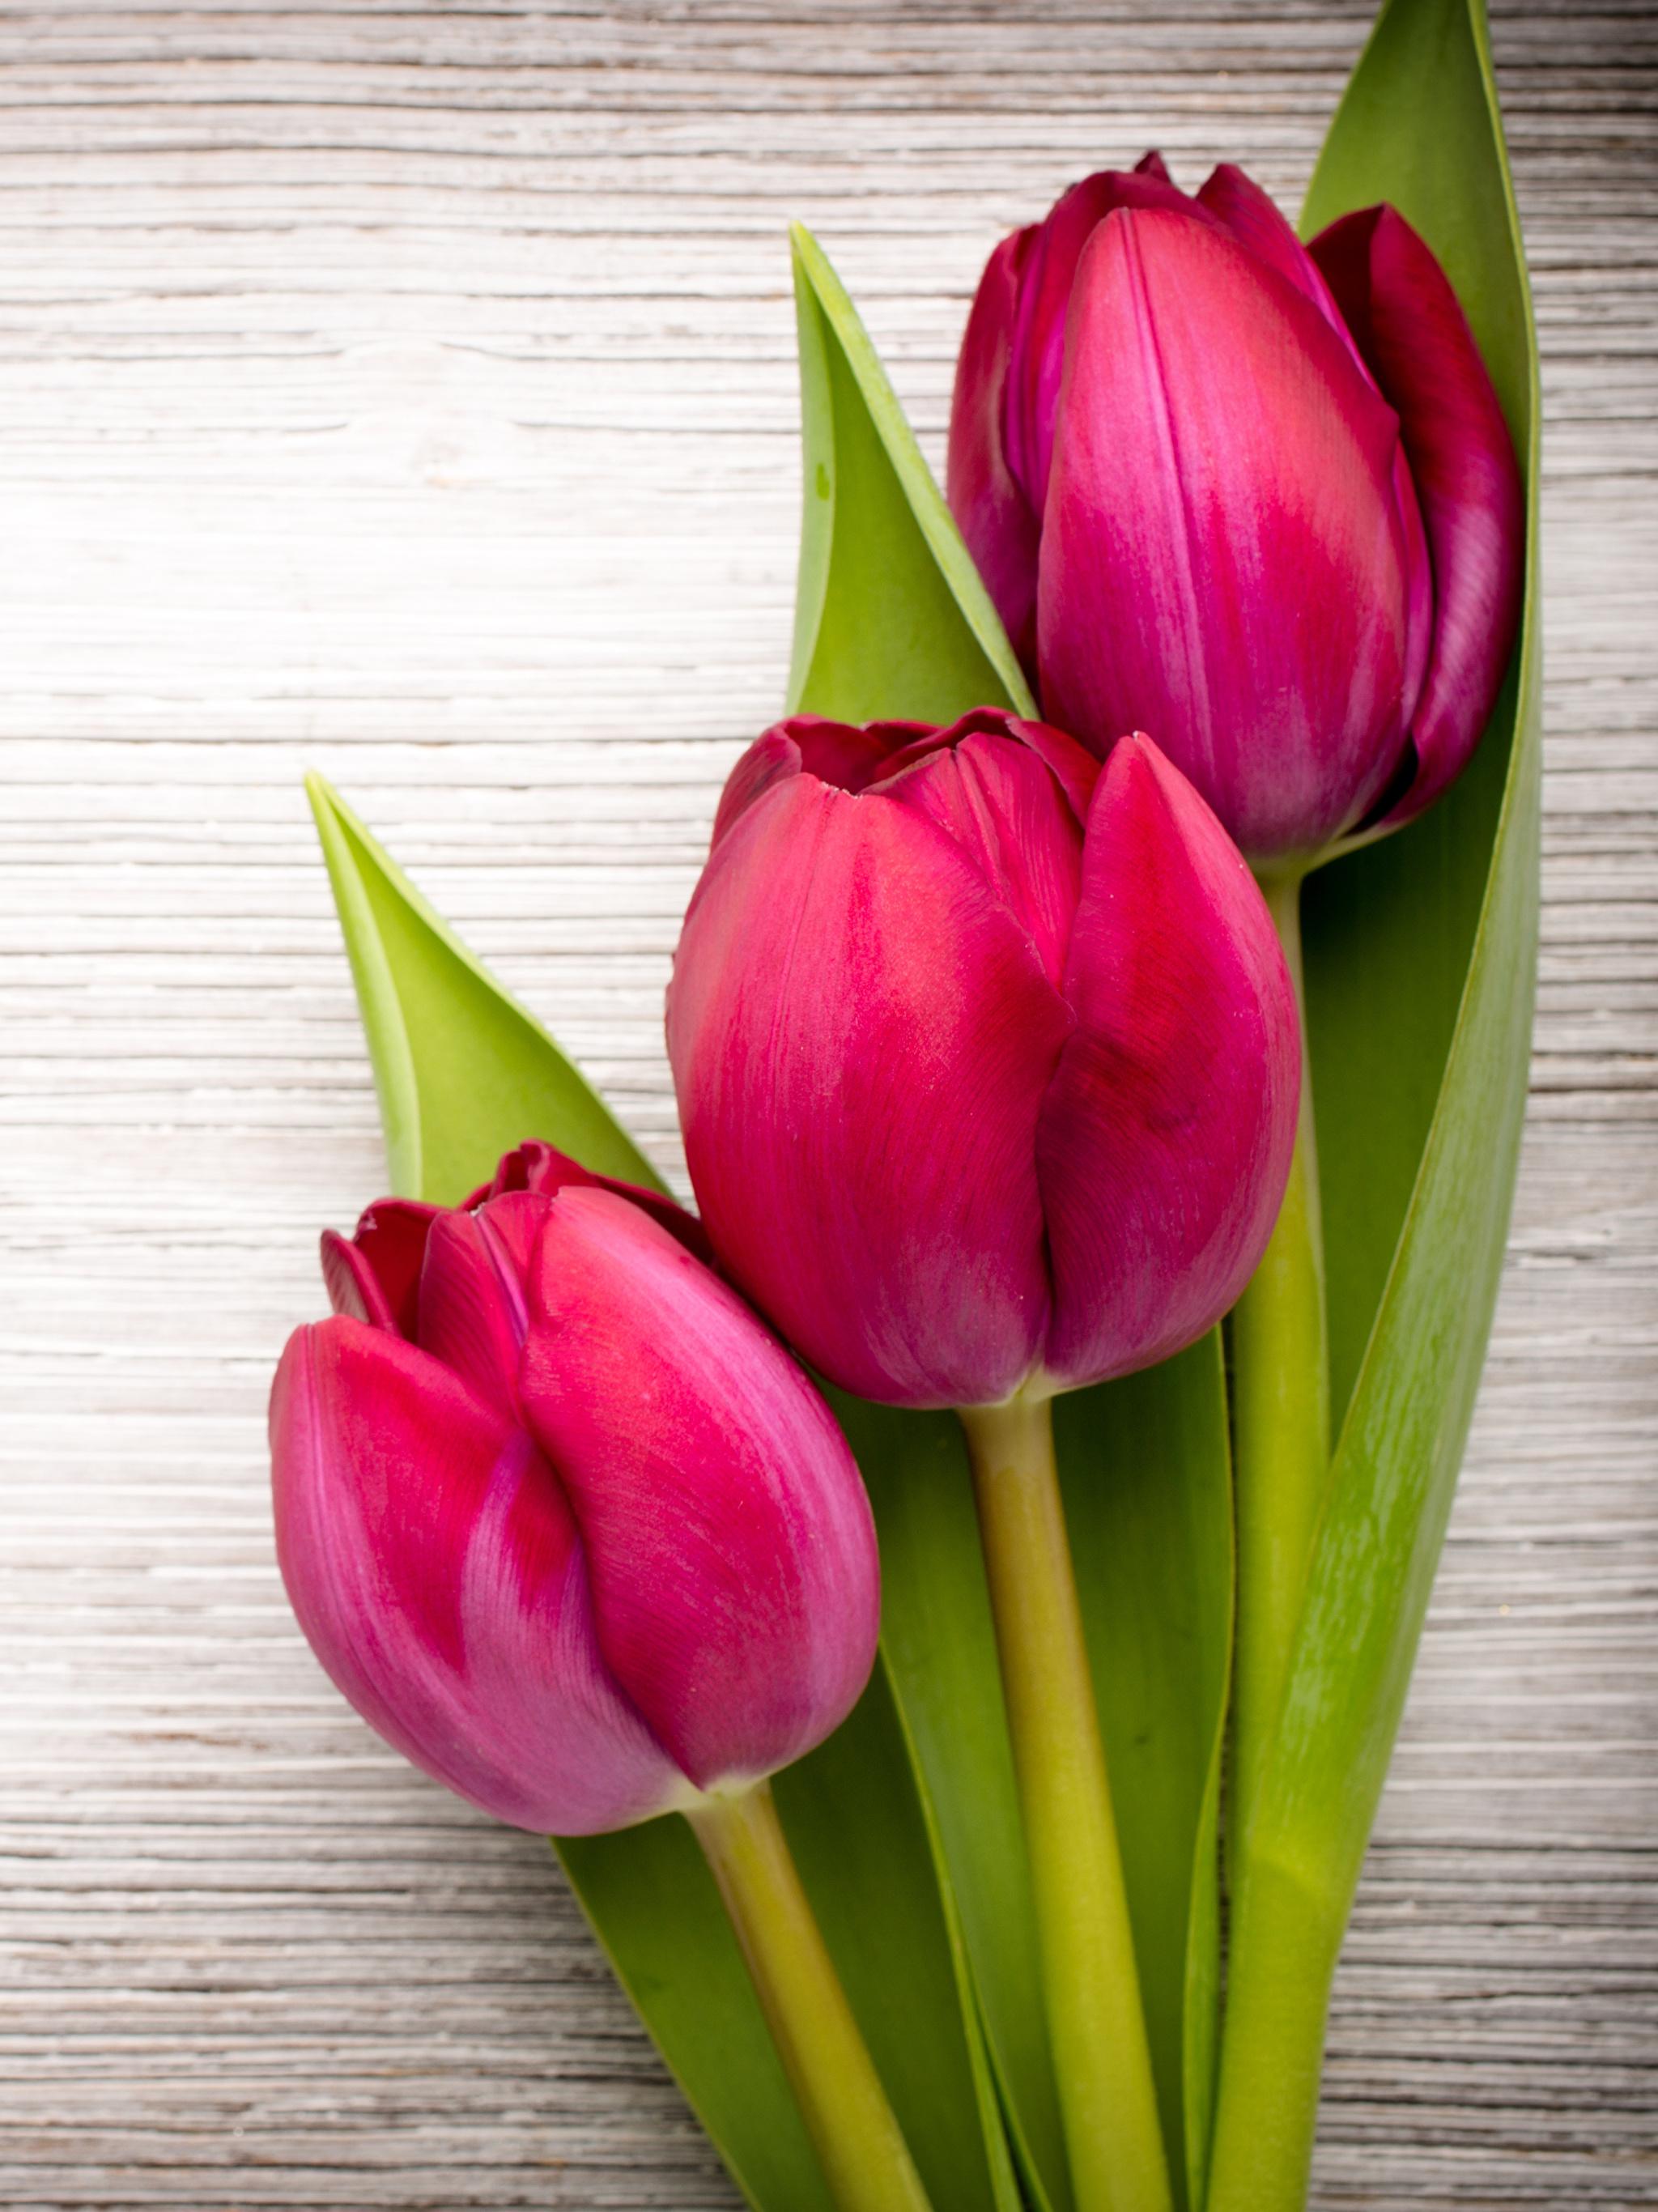 Tulips_Closeup_Wood_planks_Three_3_Red_536317_2048x2732.jpg